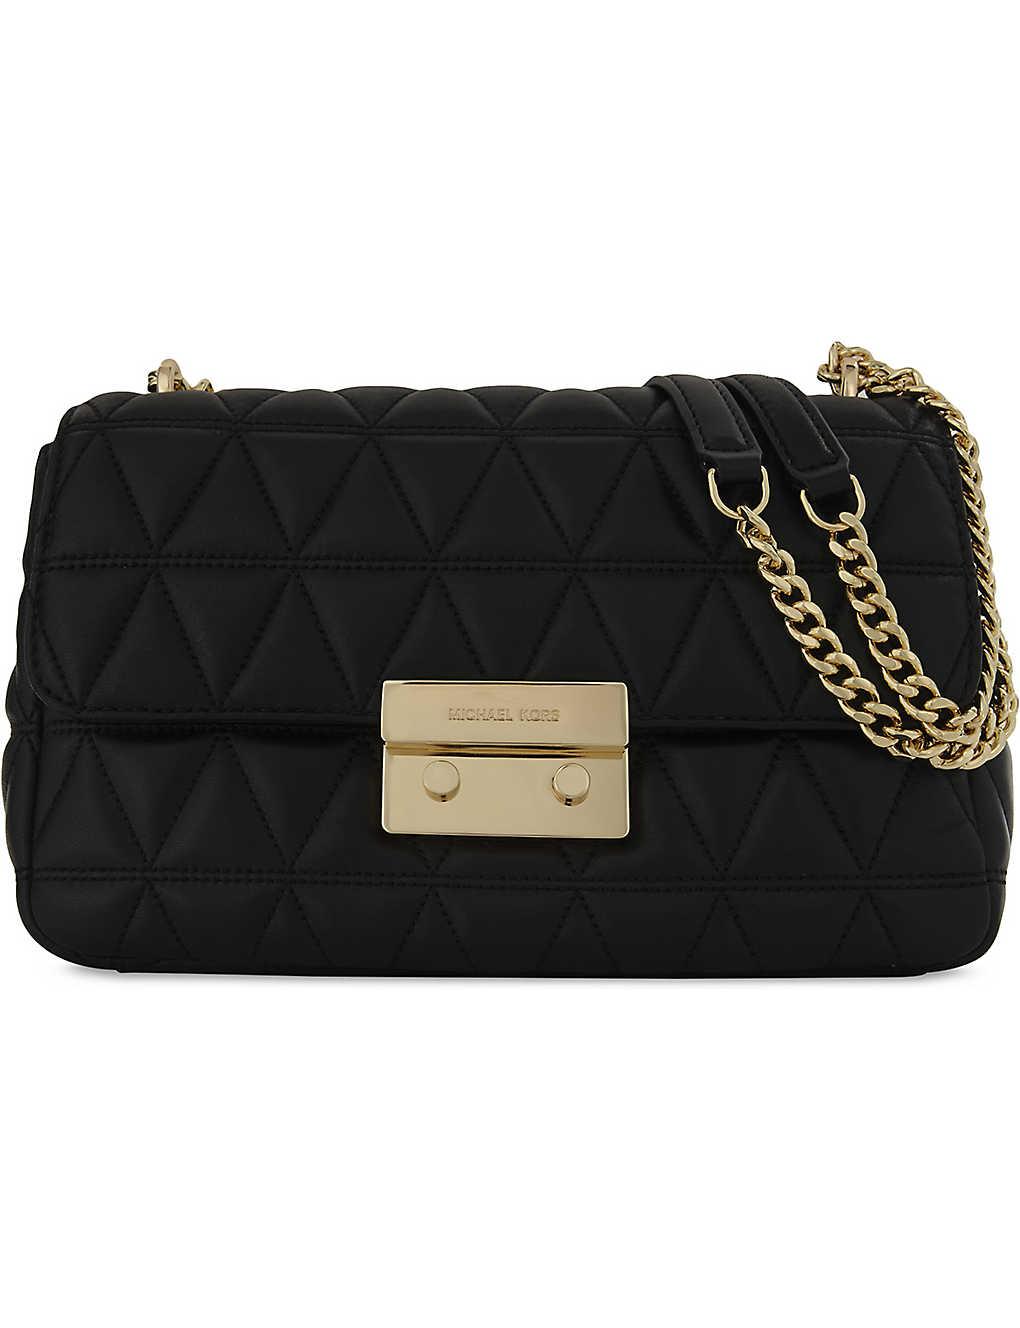 ca5724f9f04c MICHAEL MICHAEL KORS - Sloan leather shoulder bag | Selfridges.com